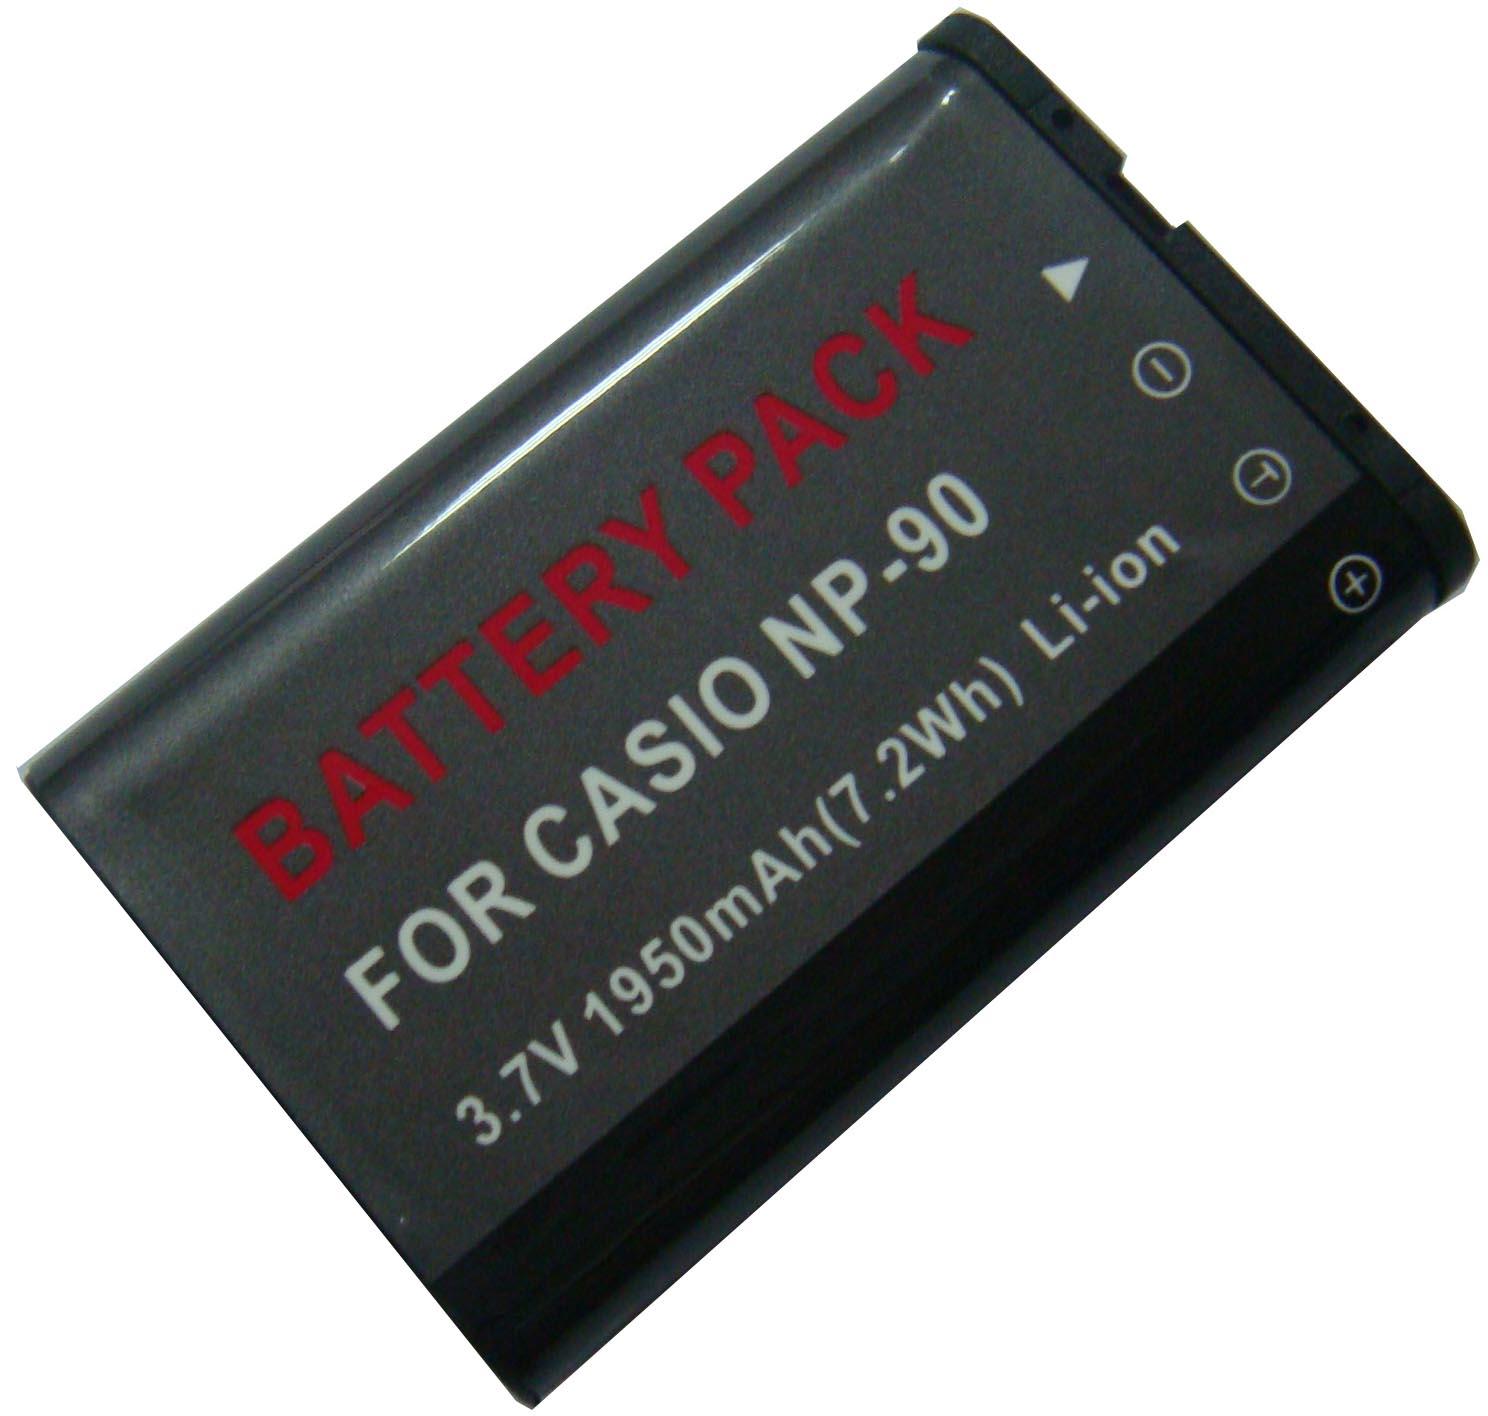 Kamera batteriNP-90til Casiokamera